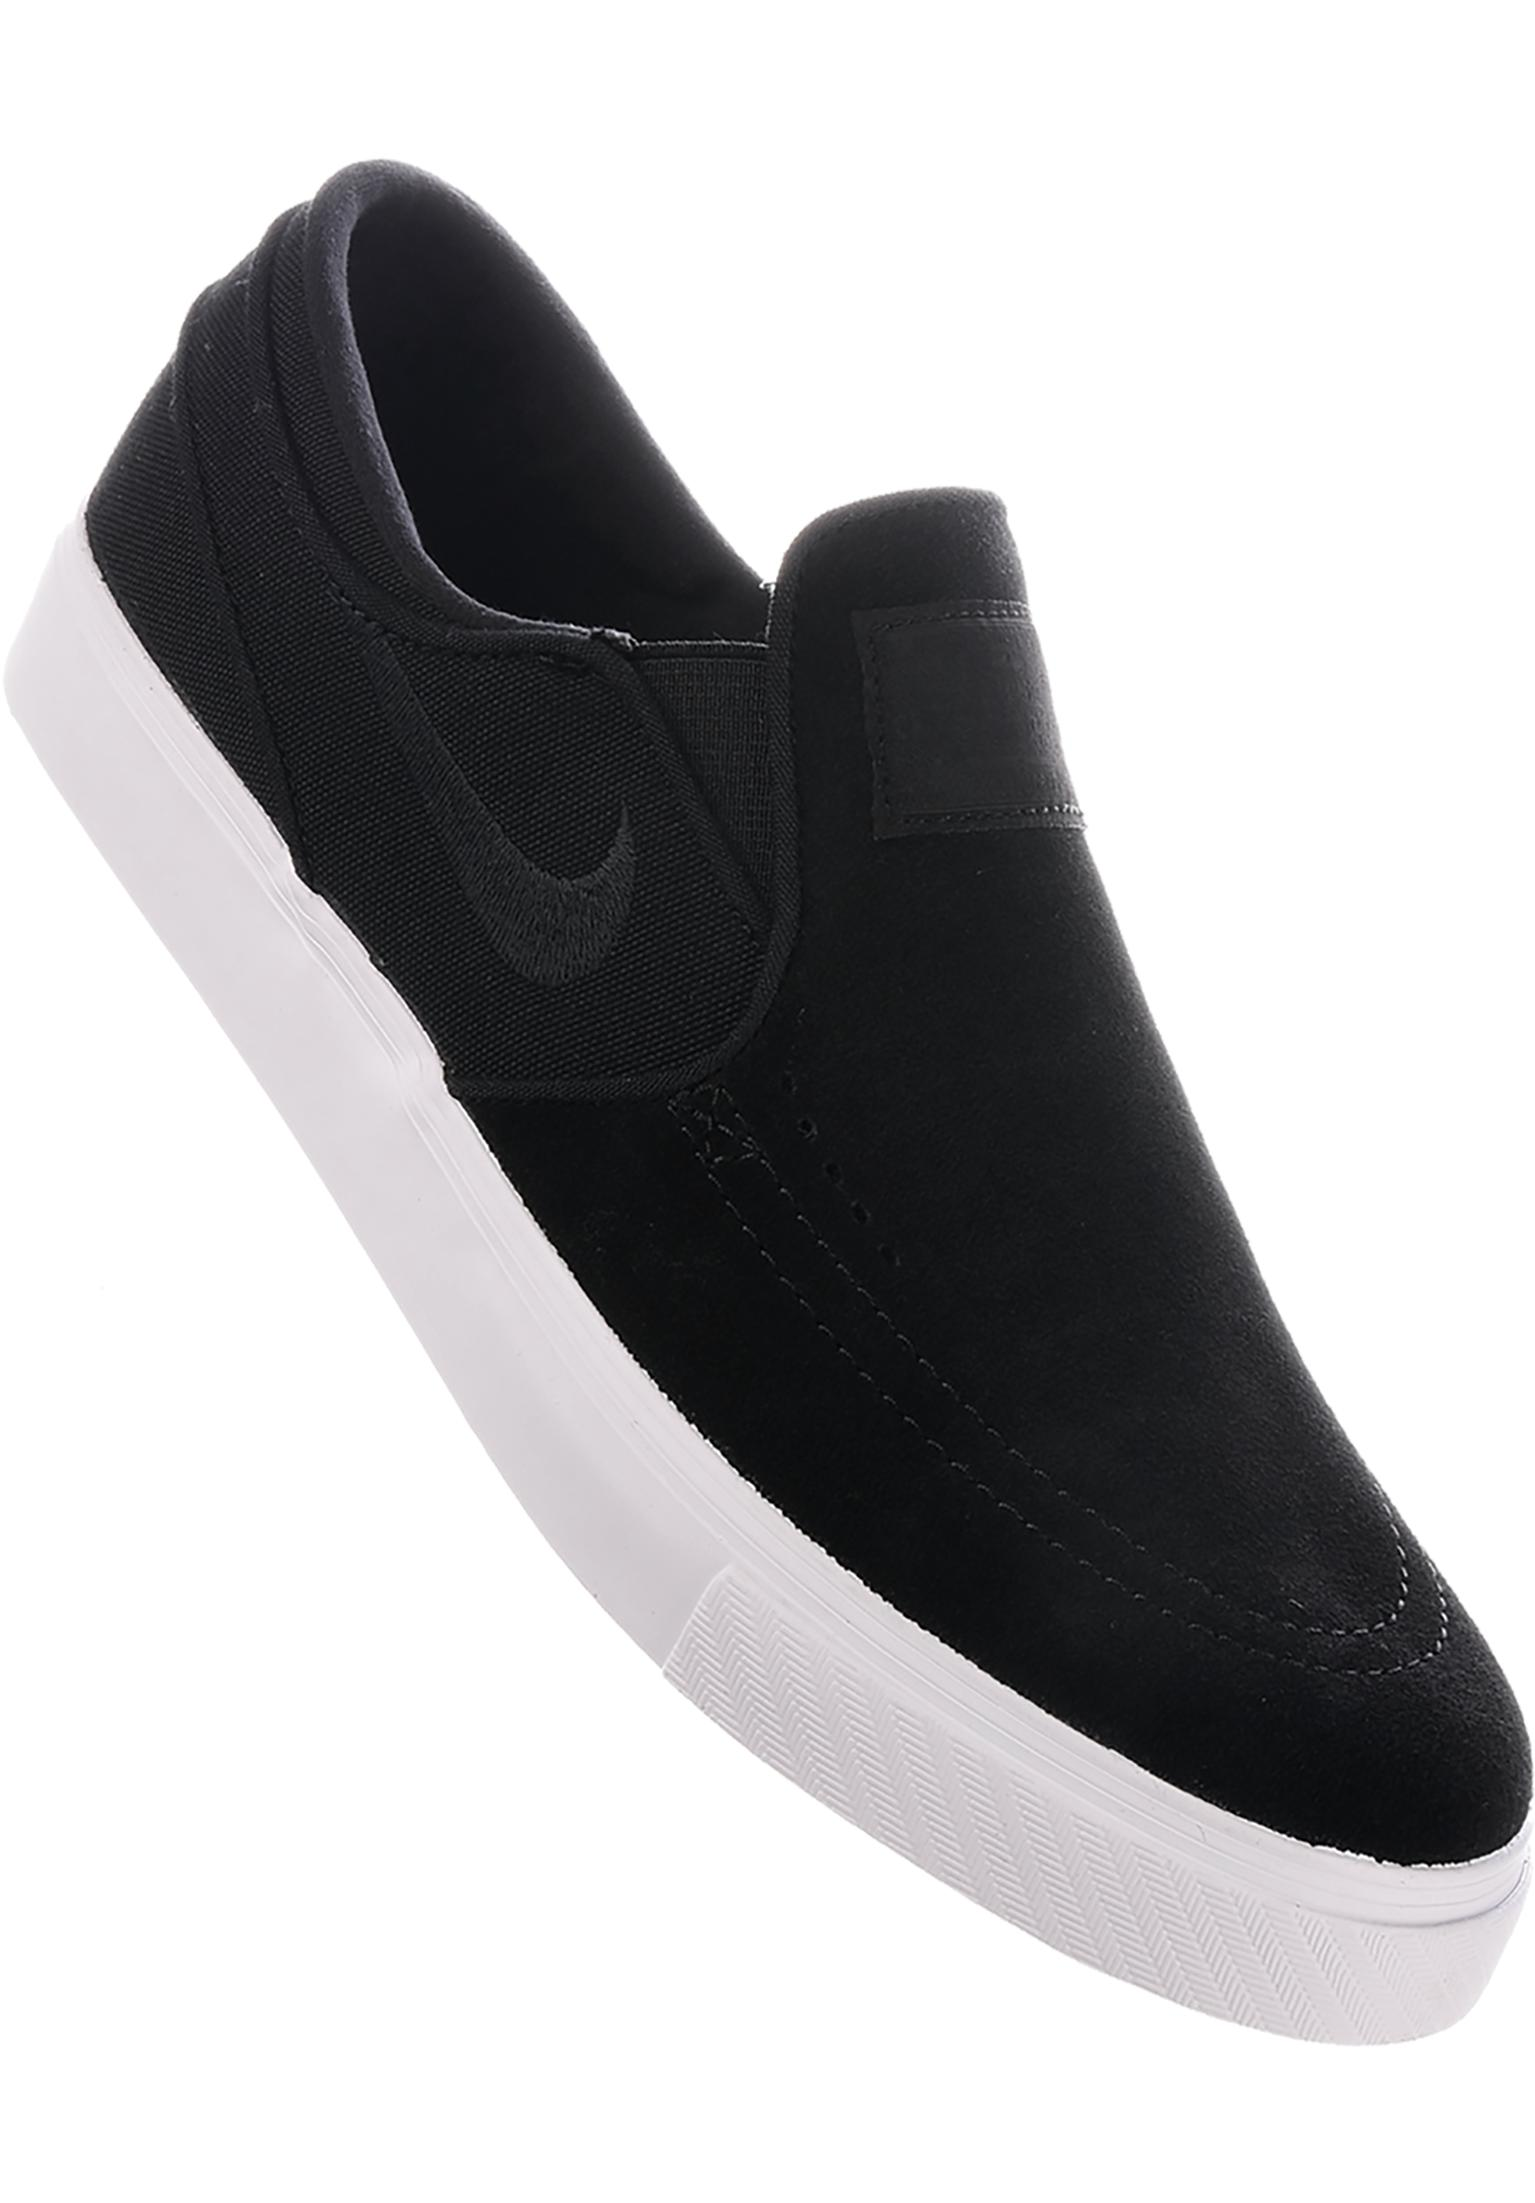 2e51d0e4cbd8a Zoom Stefan Janoski Slip On Nike SB All Shoes in black-black-white for Men    Titus